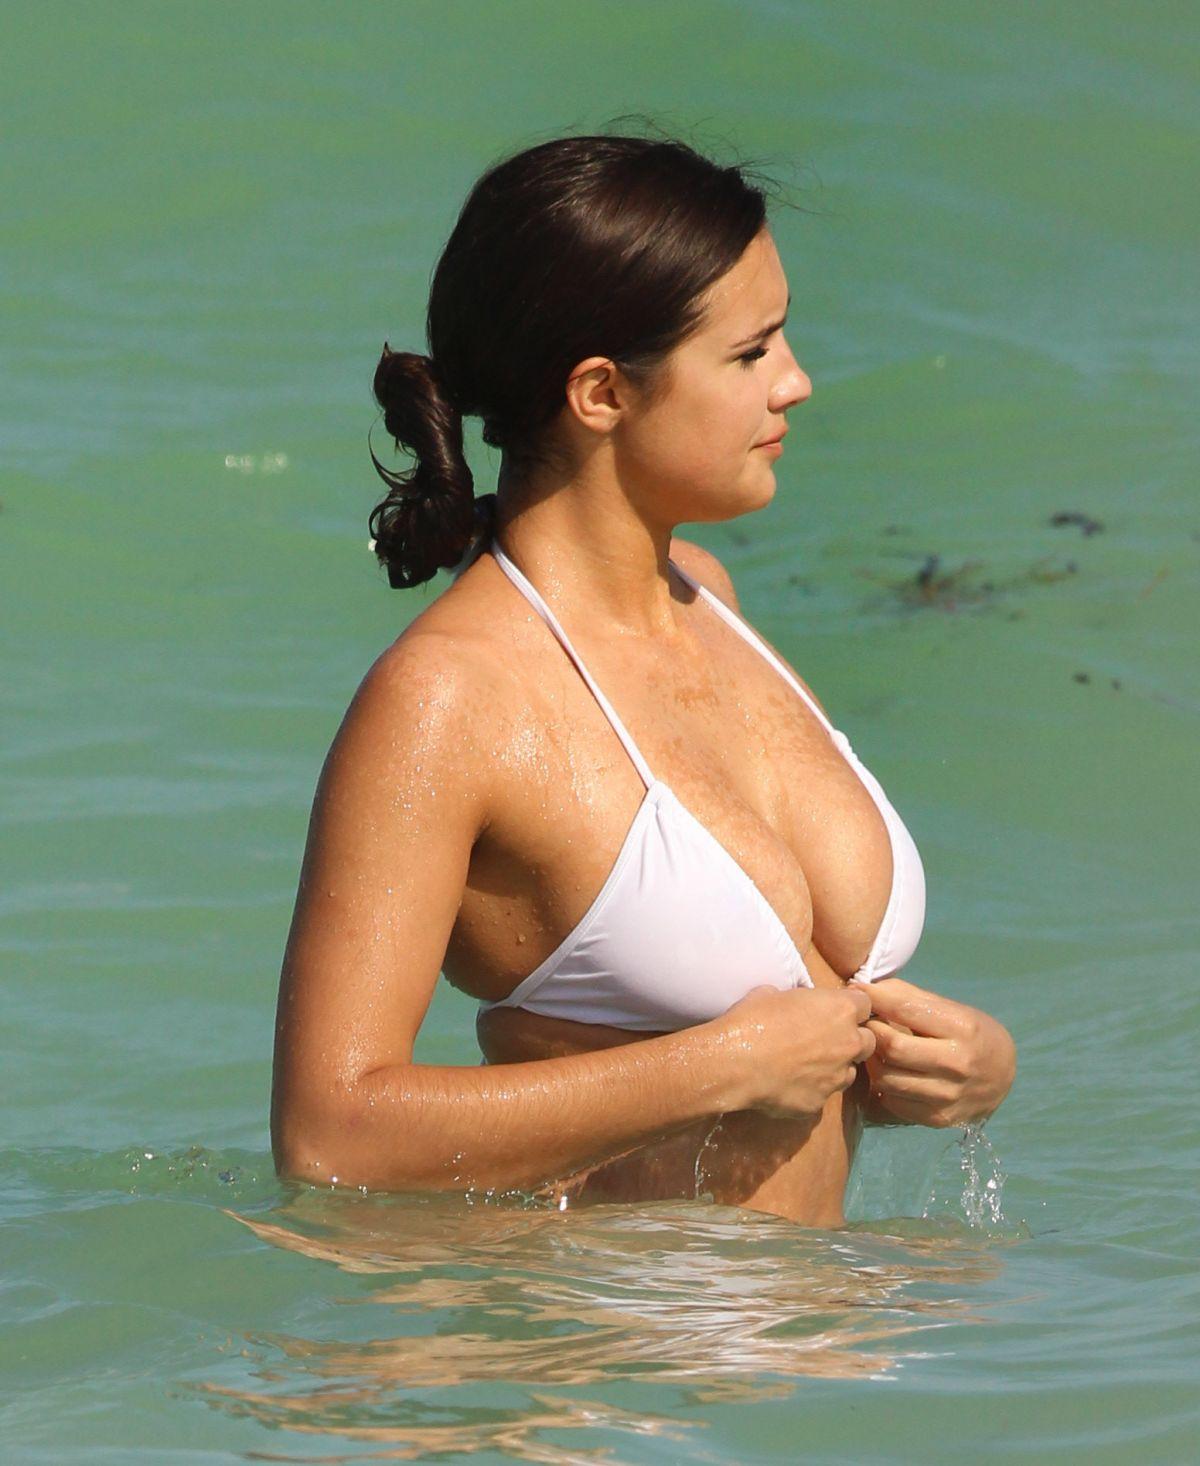 Lais Ribeiro Sexy -,Cj franco ass Porn movies Iryna ivanova sexy photos,Maggie gyllenhaal panties